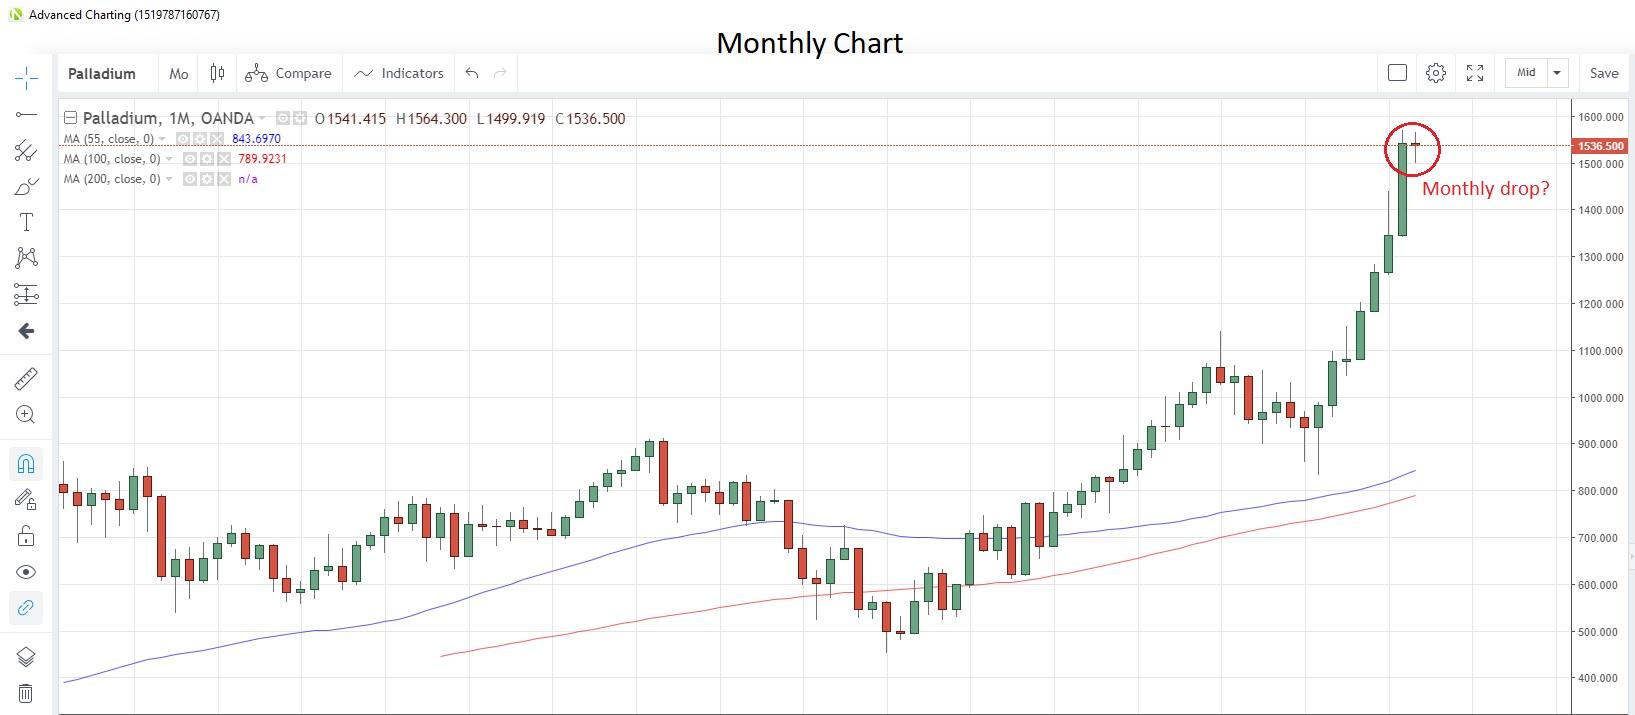 Palladium Monthly Chart